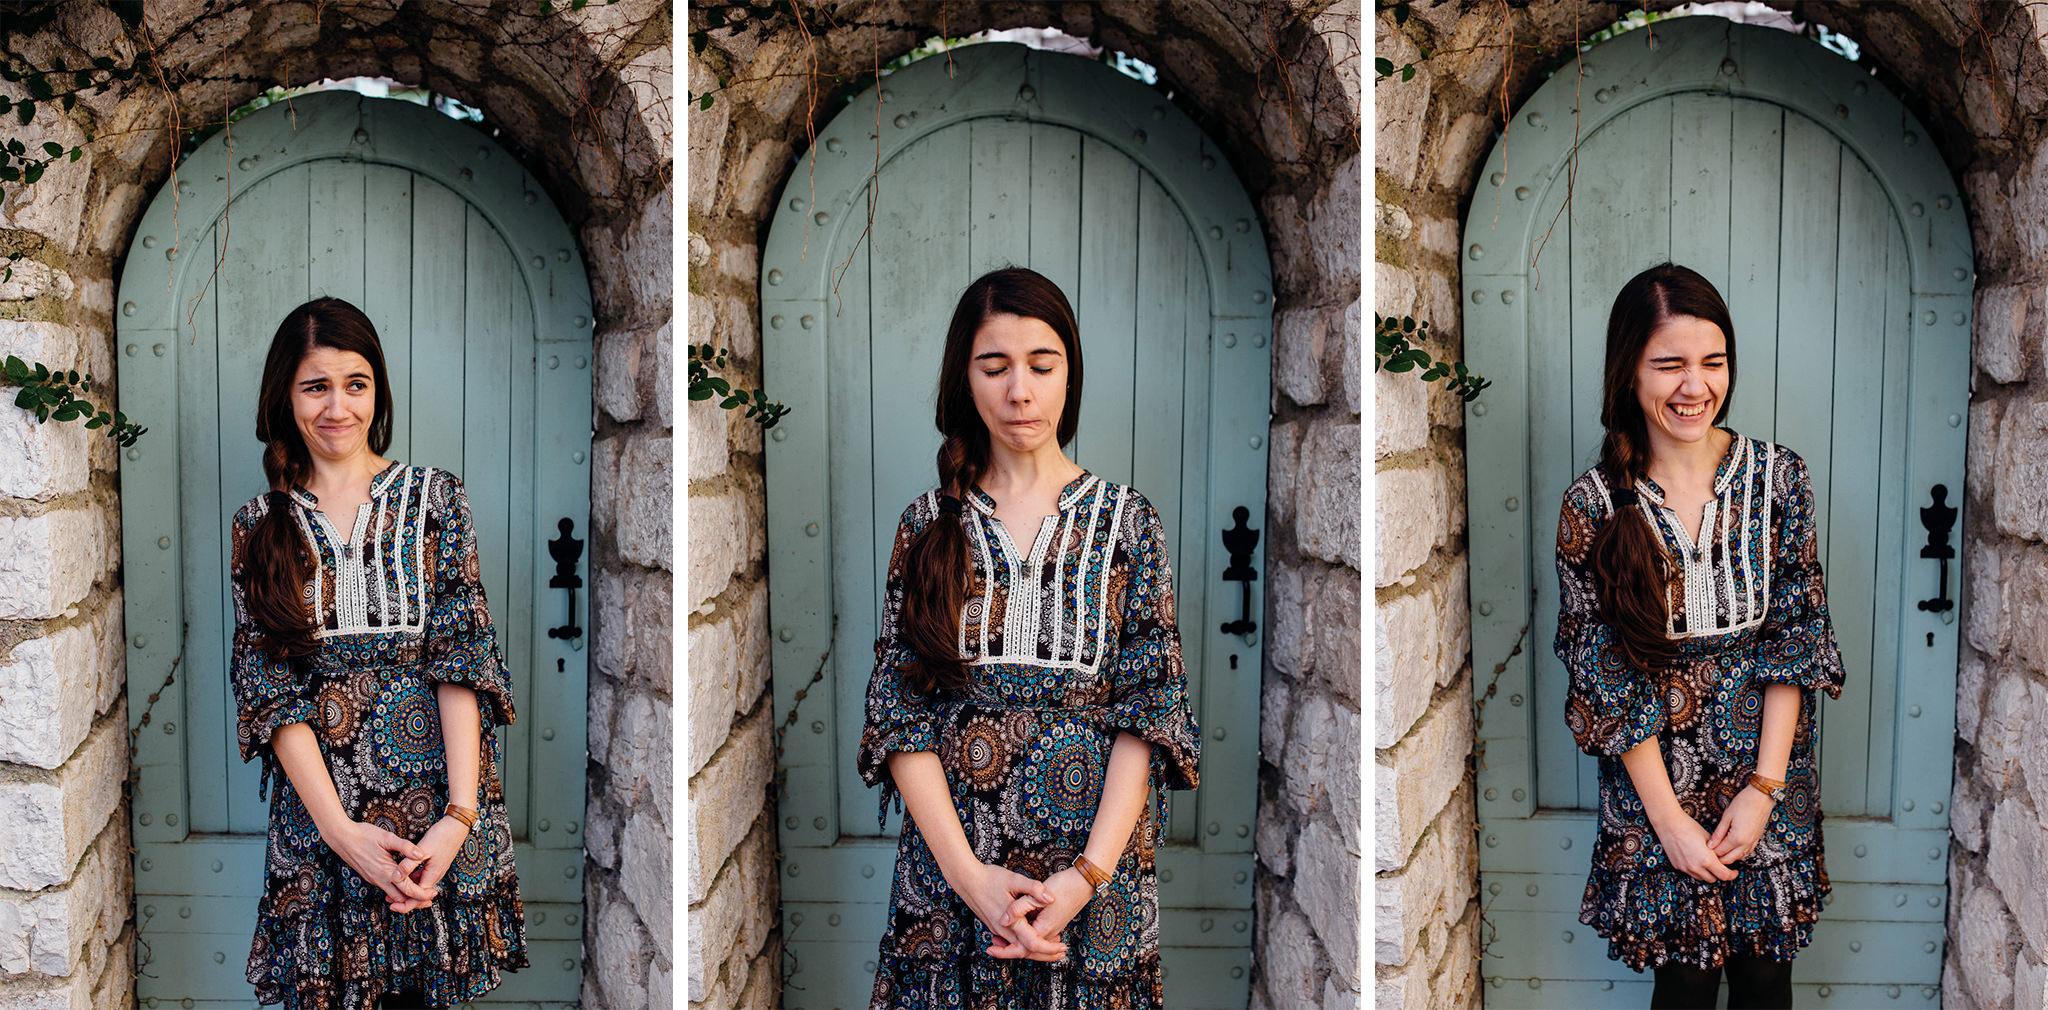 Bogdan-&-Luiza-engagement-Nice-France-1037